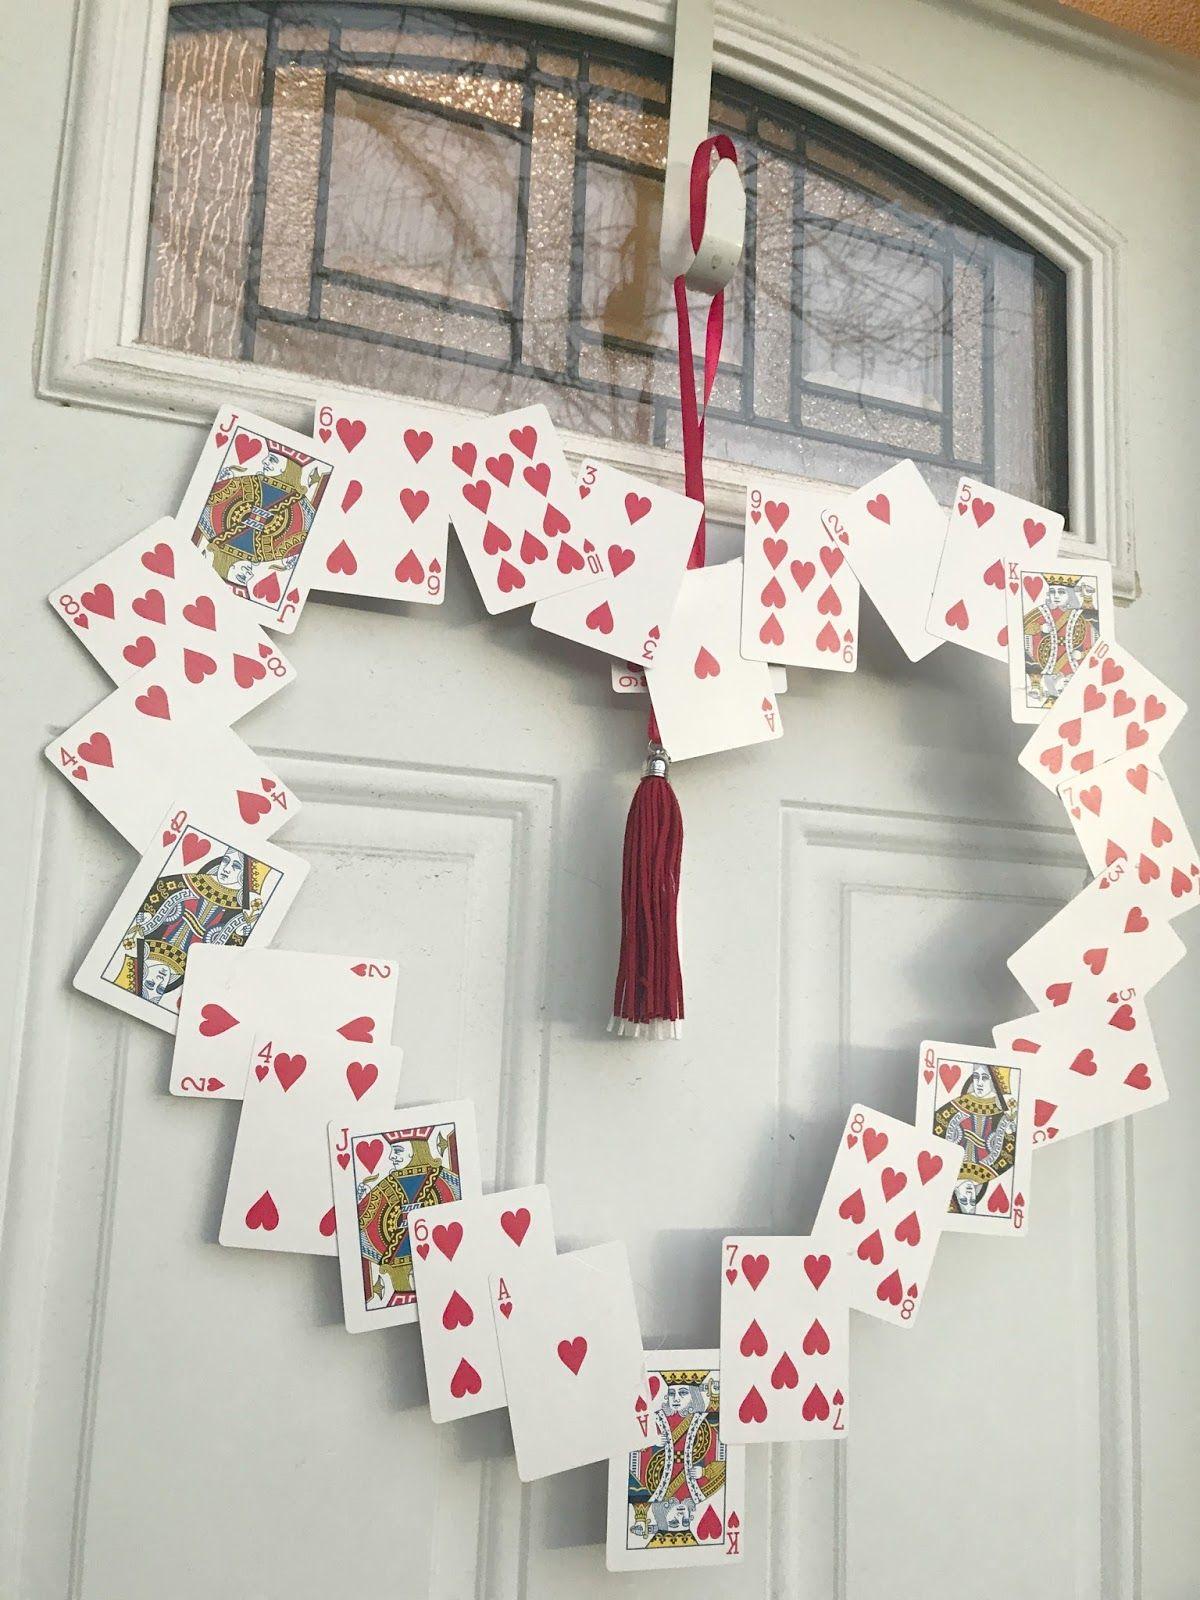 Playing Card Valentine S Day Wreath Diy Valentine S Day Decorations Wonderland Party Decorations Valentine Decorations